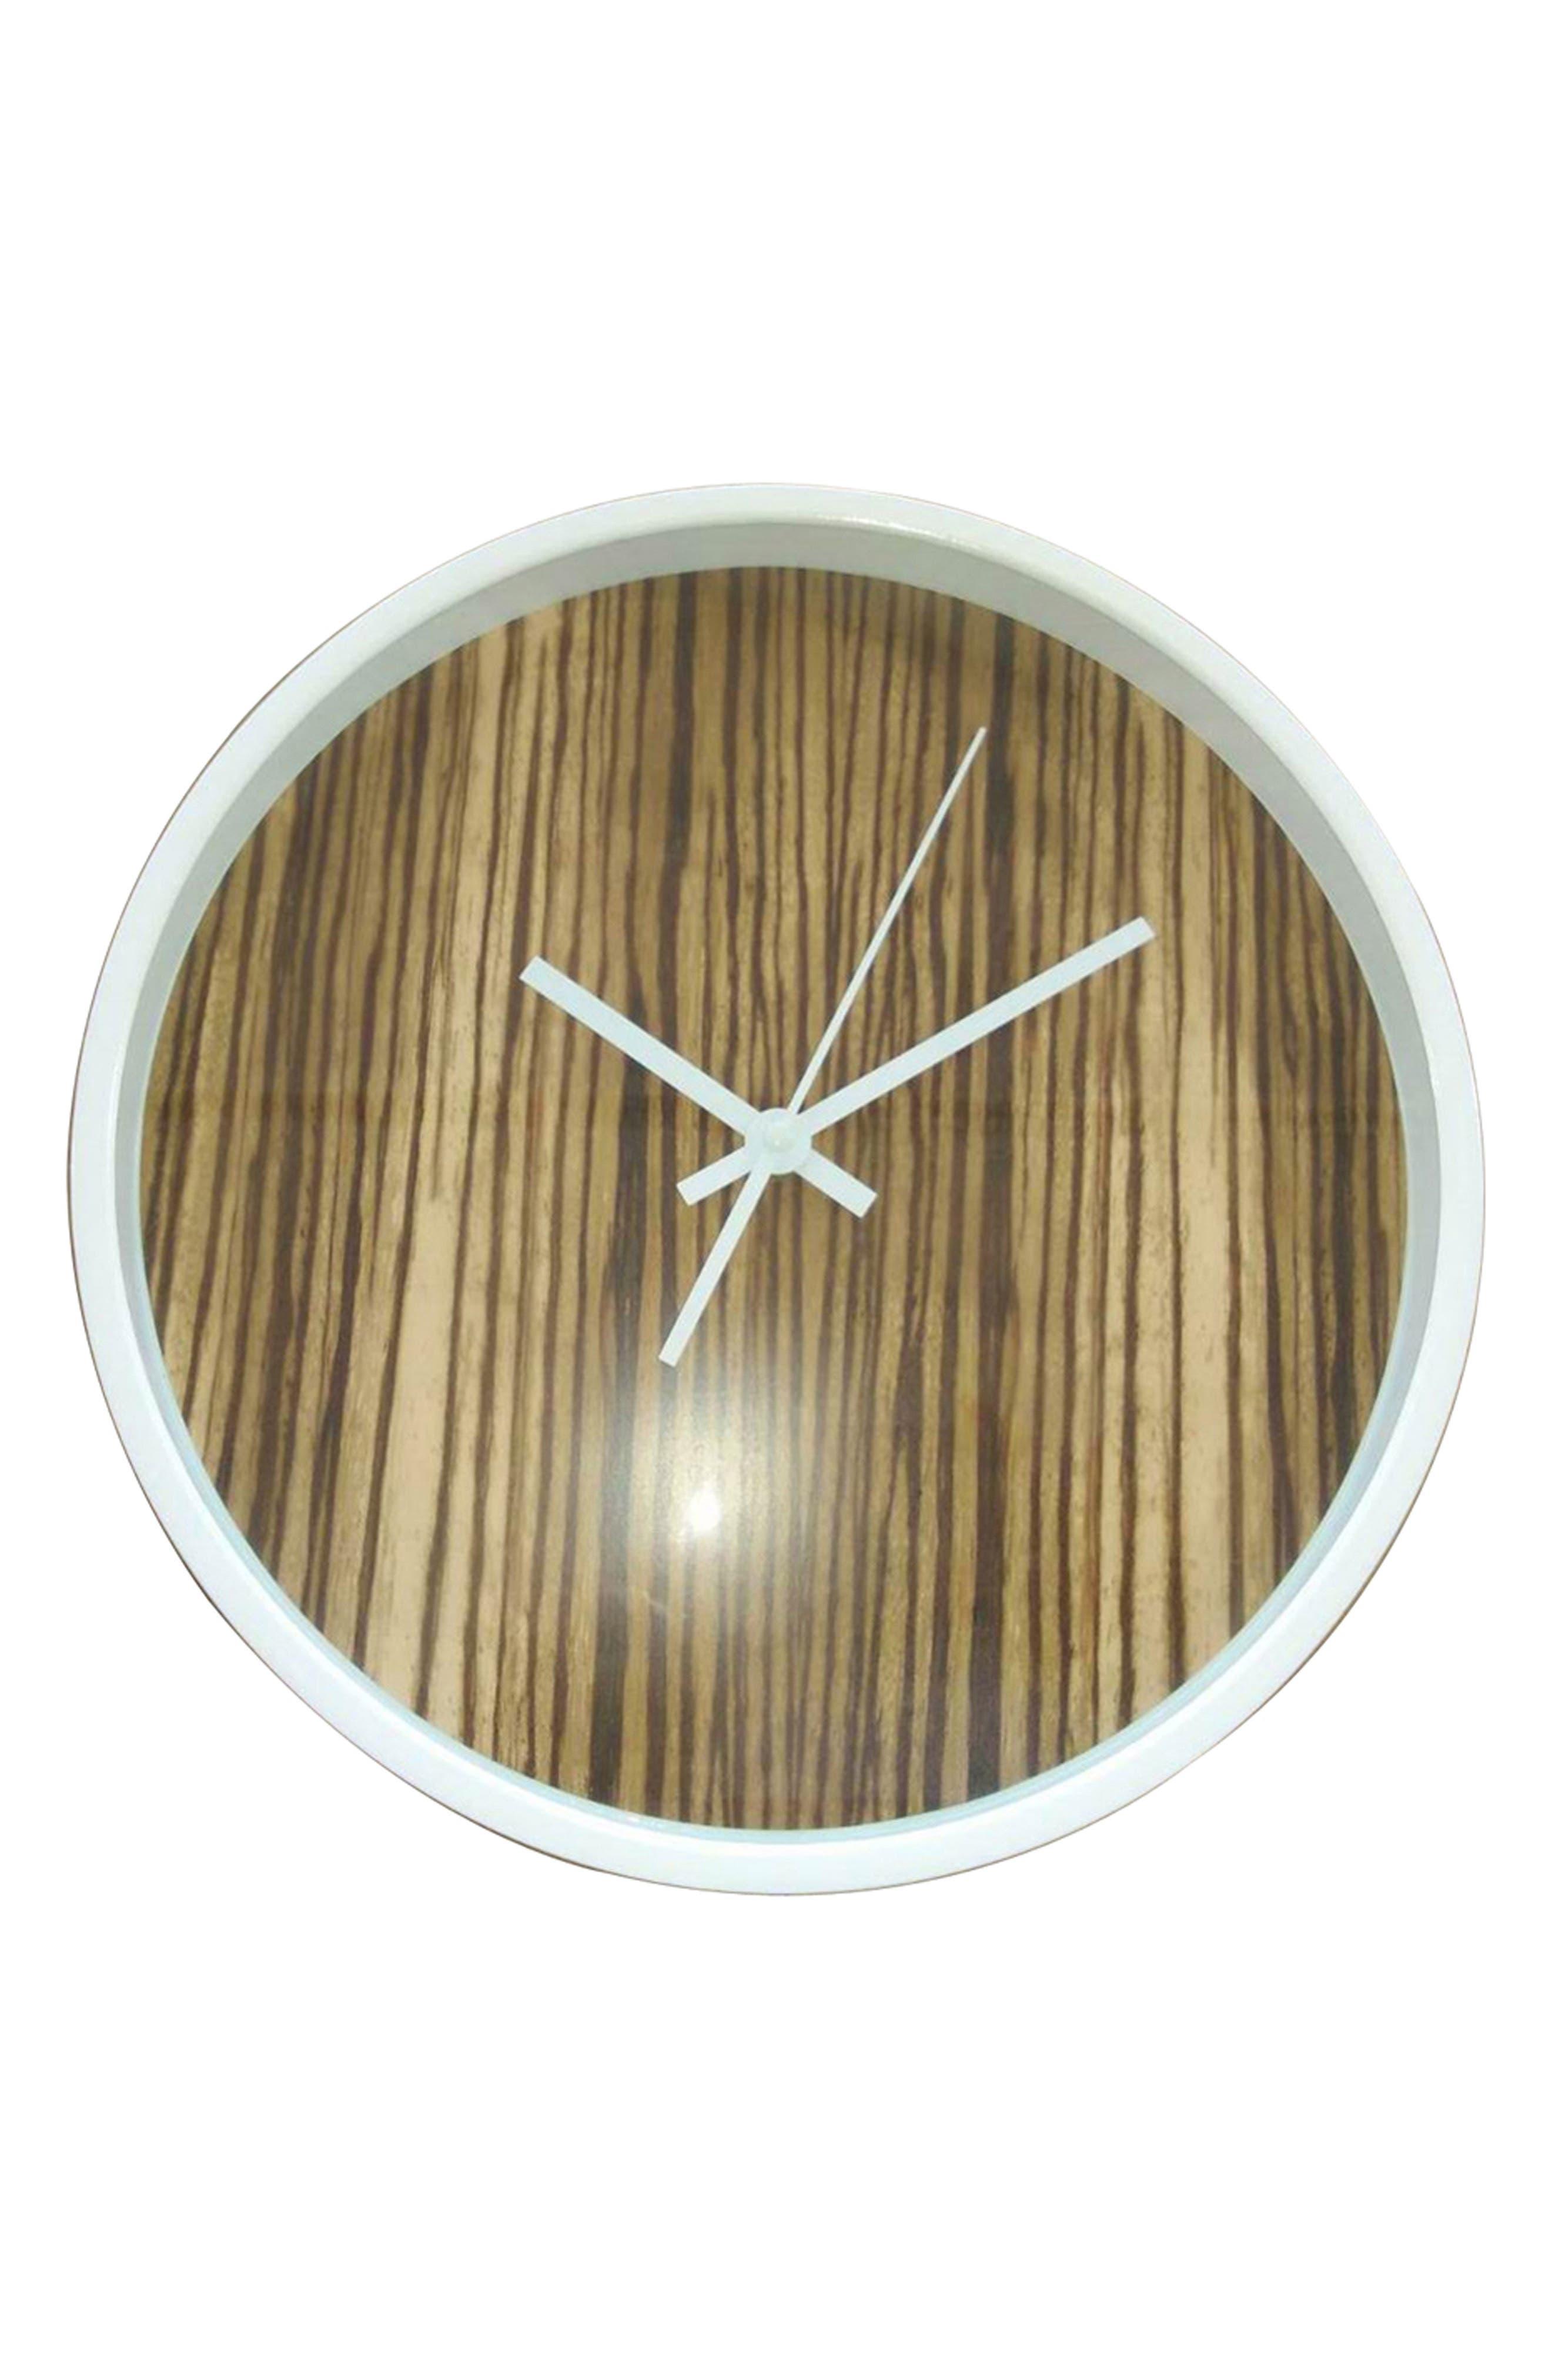 Alternate Image 1 Selected - Crystal Art Gallery Wood Print Wall Clock